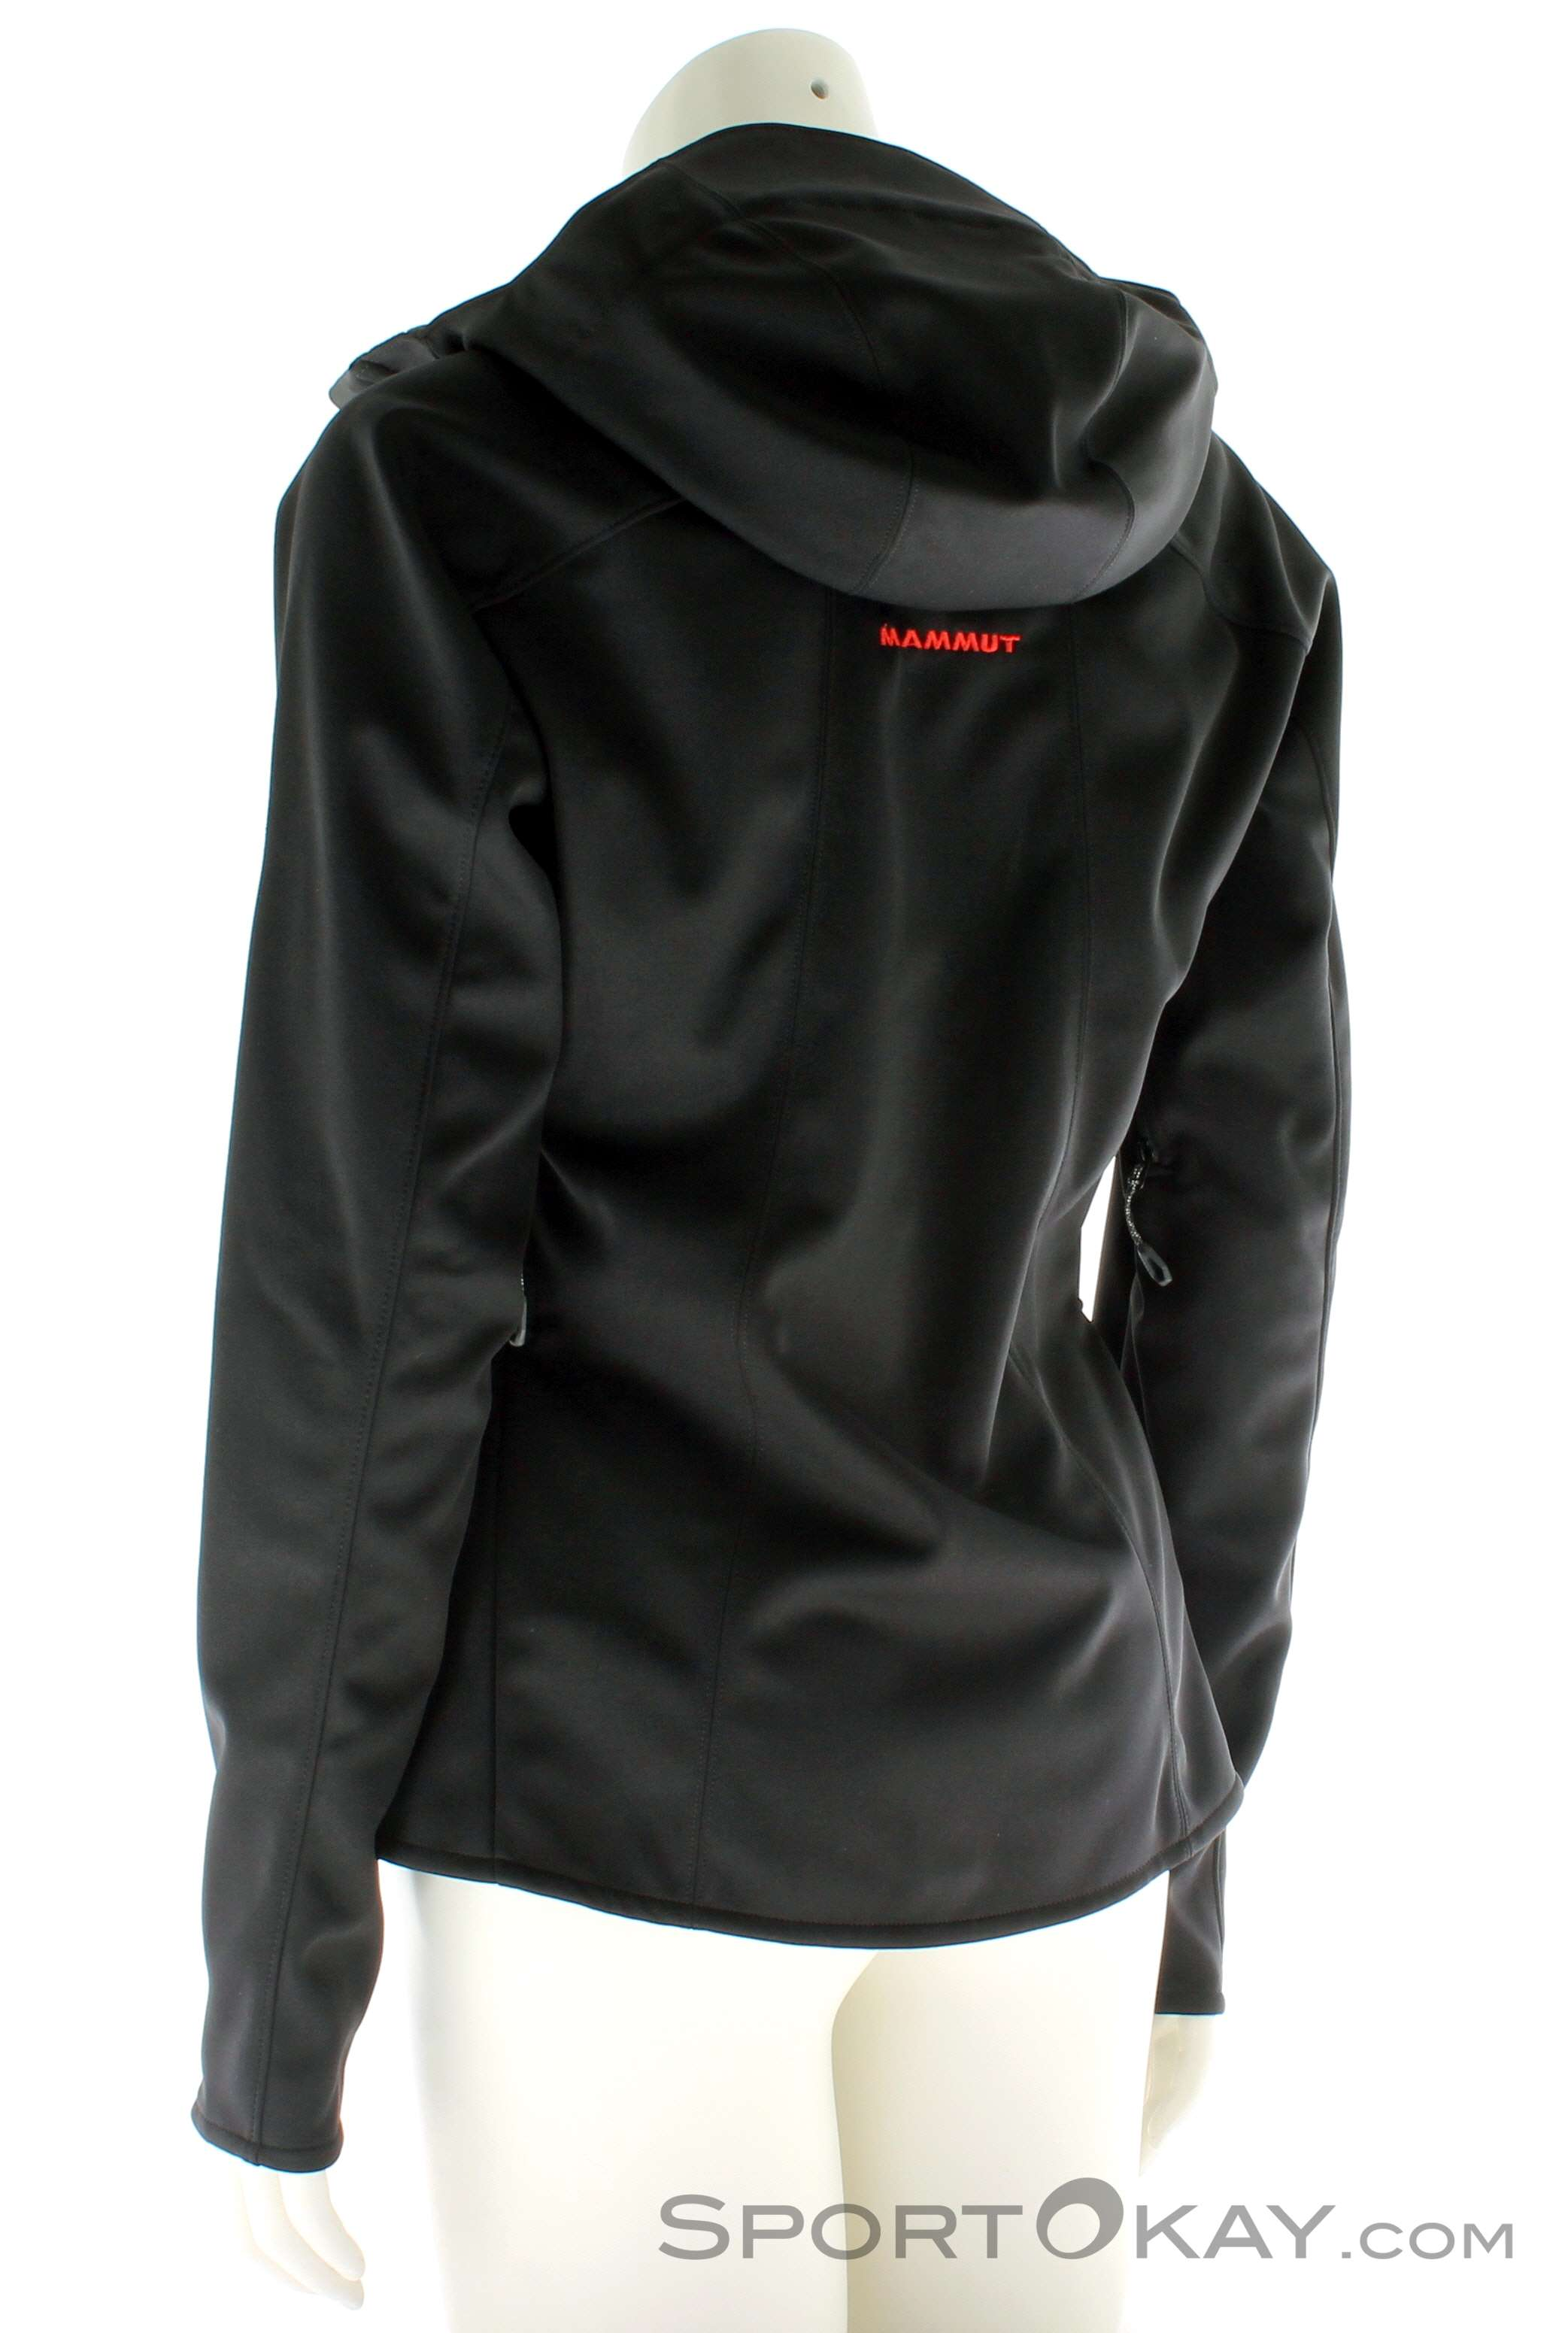 huge discount 97c9e a6d8a Mammut Mammut Ultimate Hoody Womens Softshell Outdoor Jacket